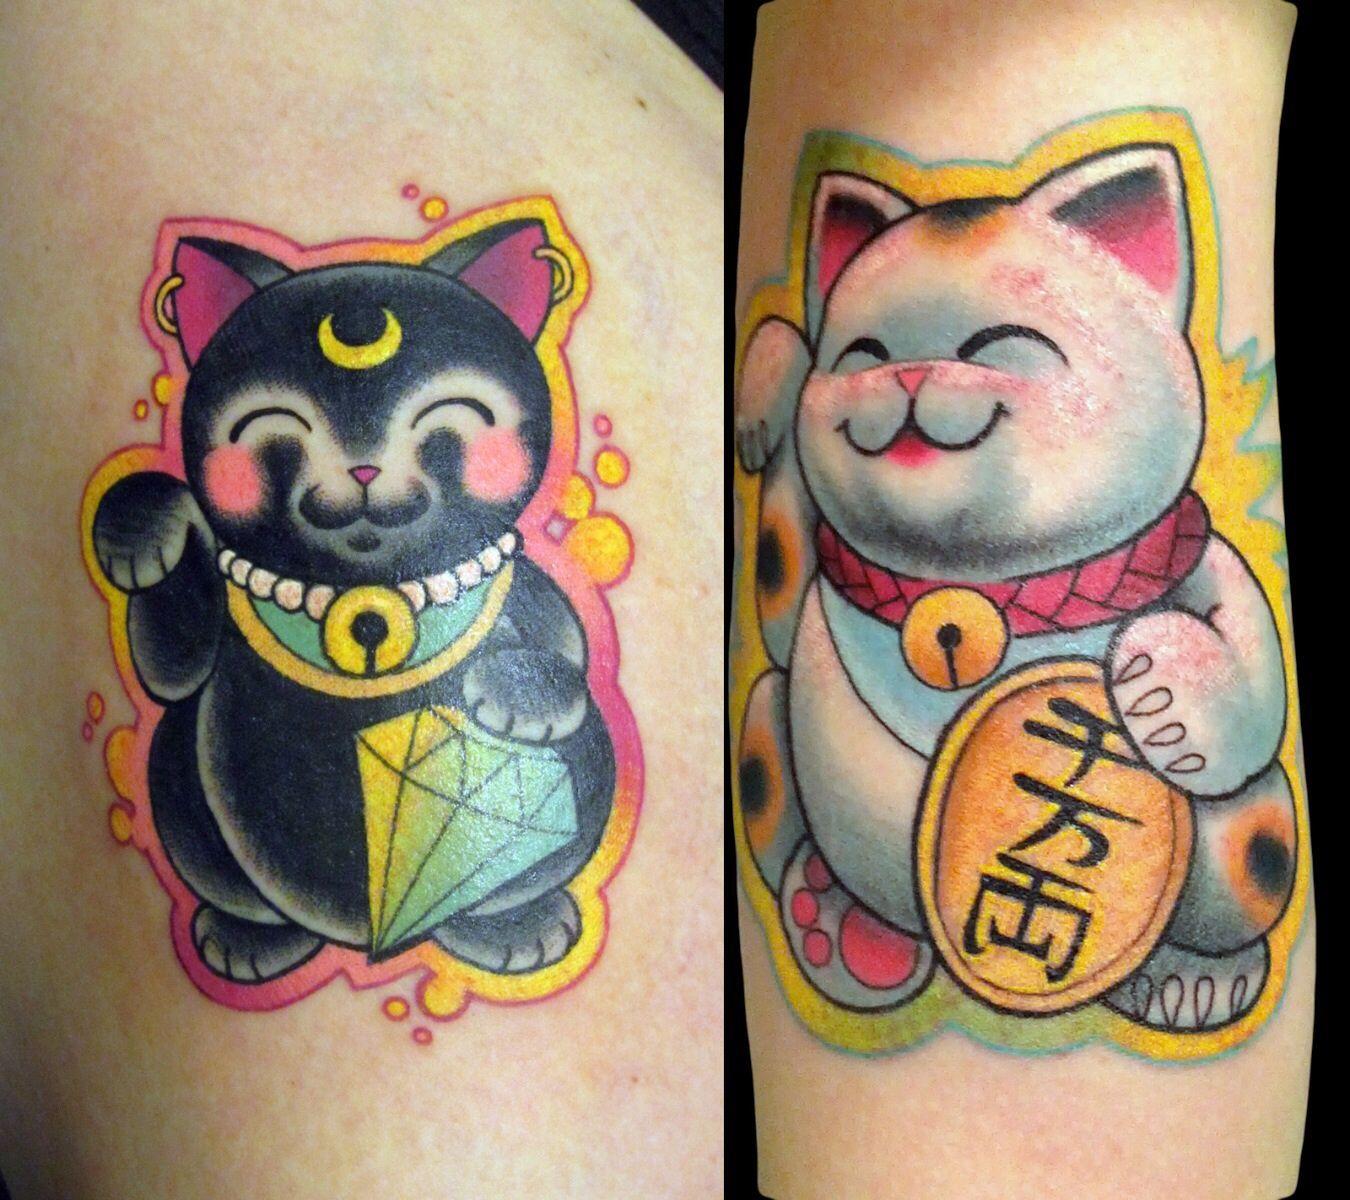 maneki neko tattoos by morgan macdonald at seven crowns tattoo in toronto tattoo ideas. Black Bedroom Furniture Sets. Home Design Ideas